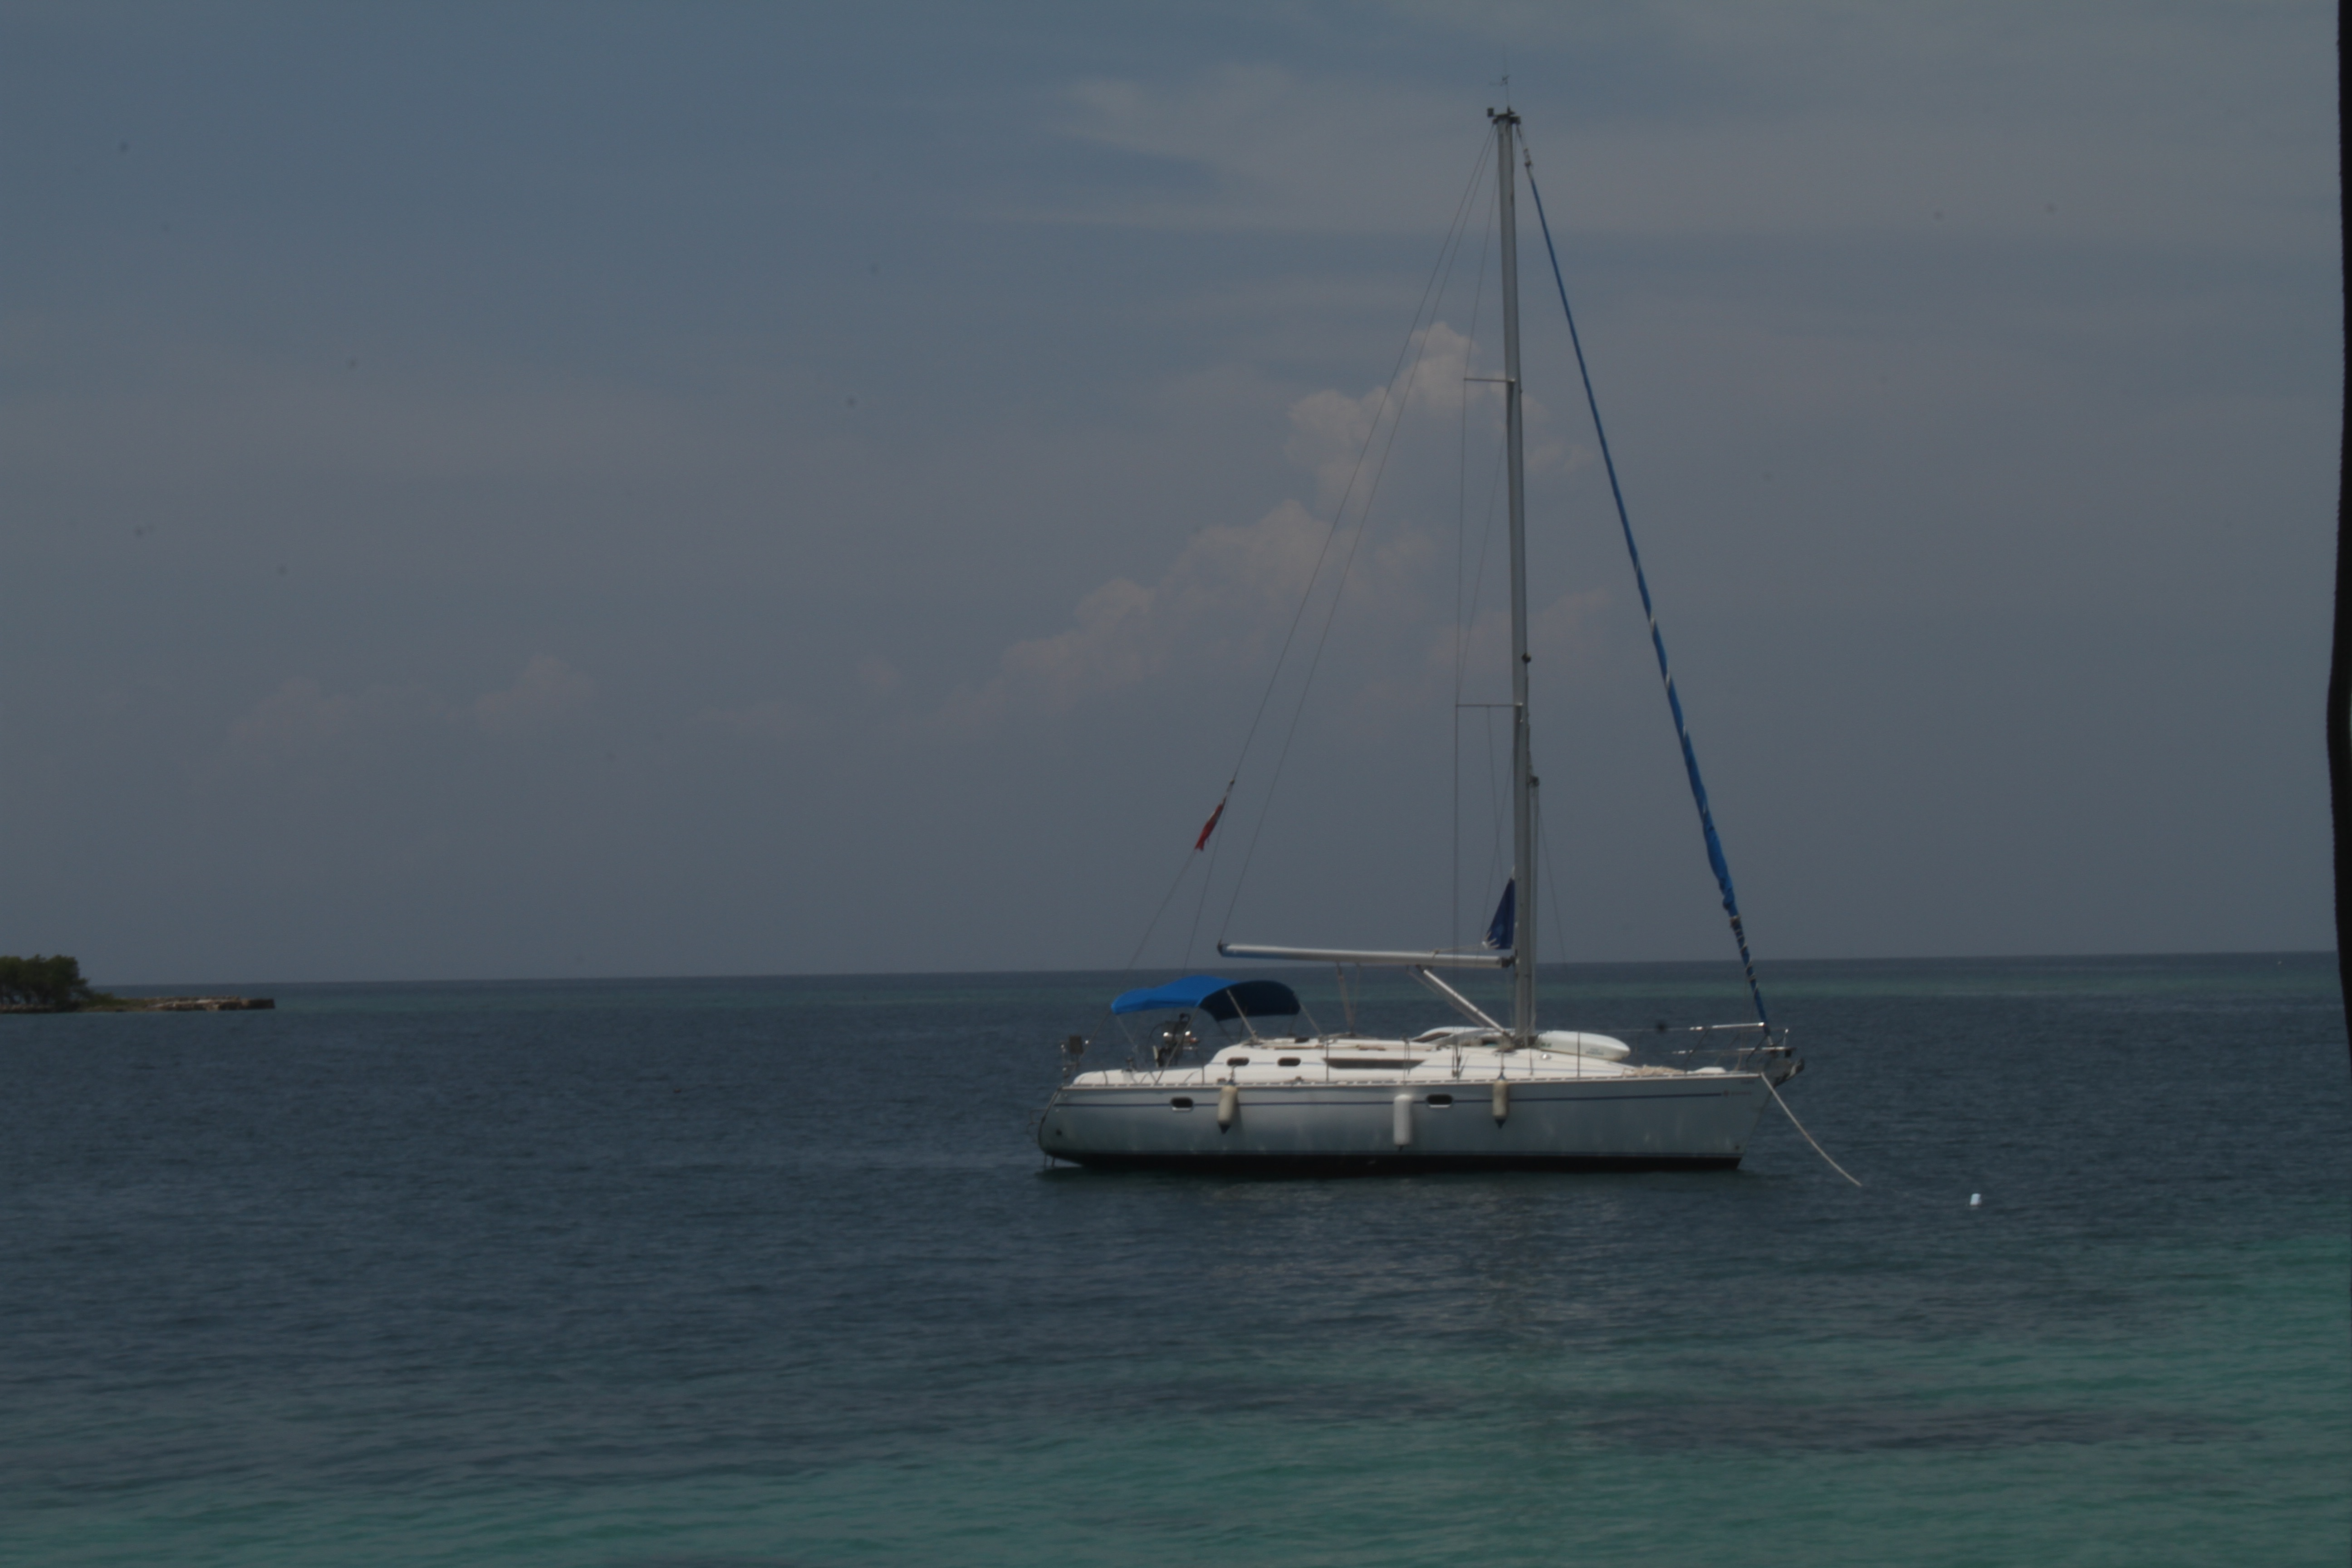 Jeanneau Sun Odyssey 36.2 Sloop